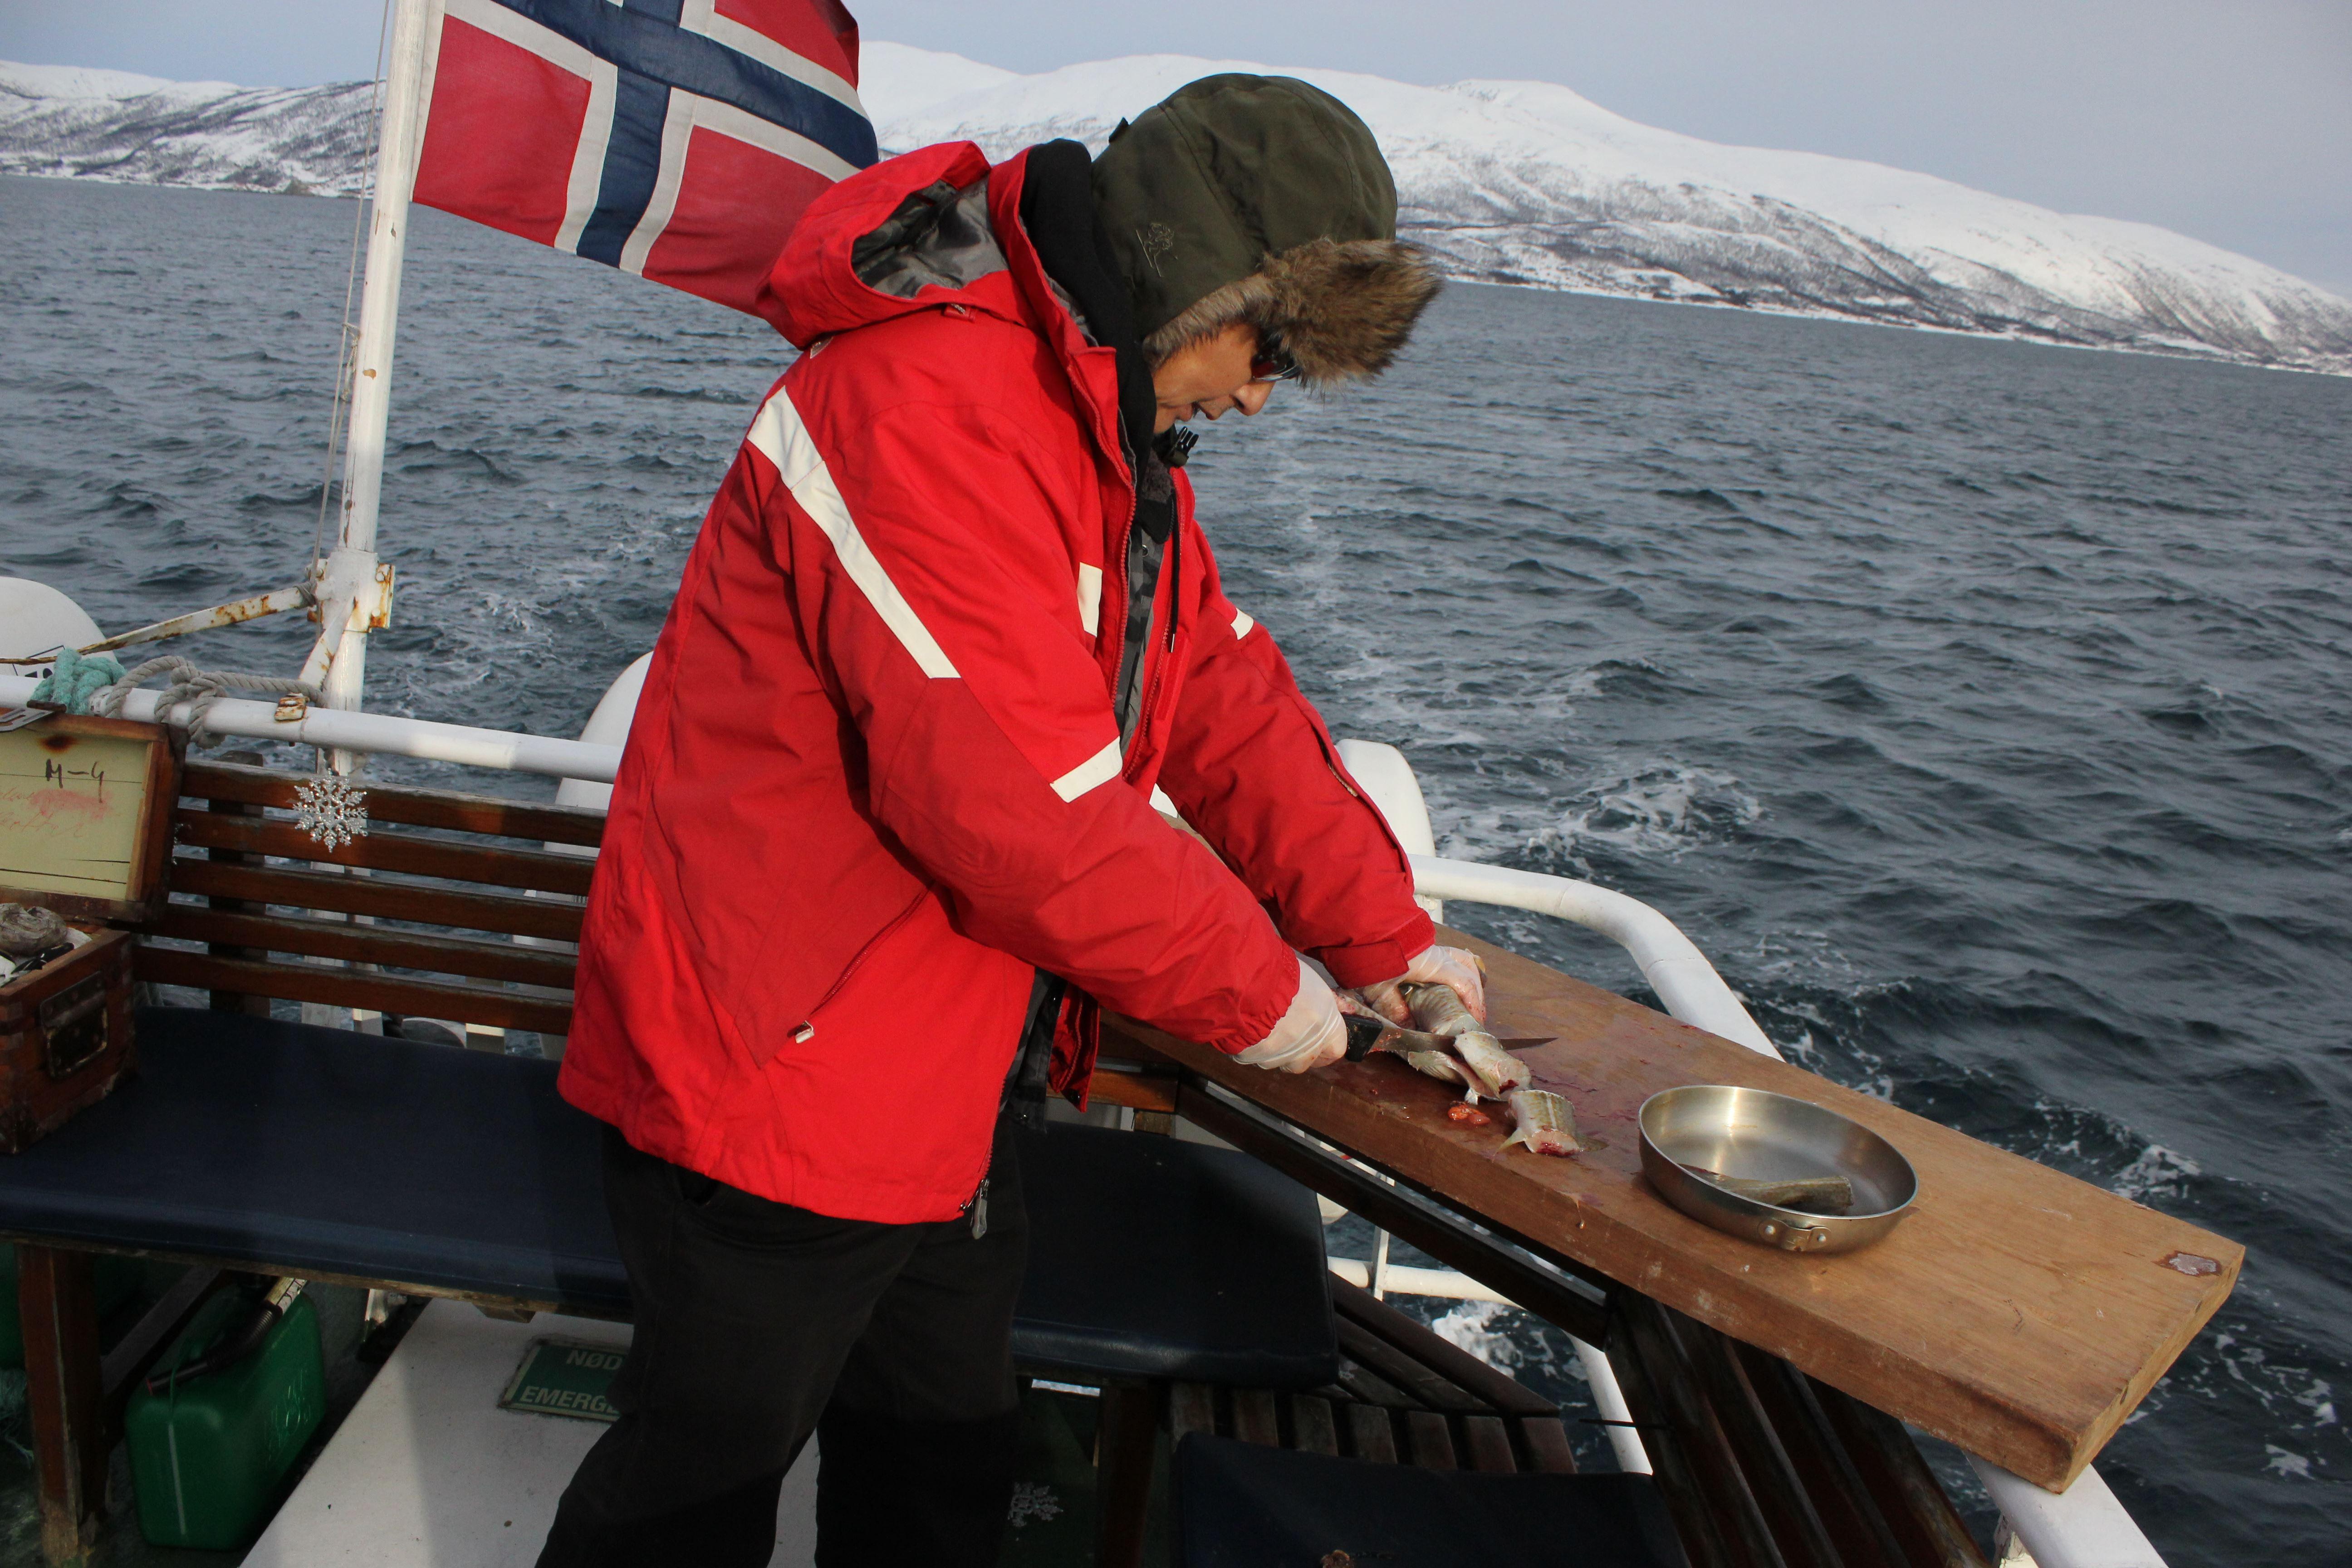 Fjord fishing at the edge of Tromsø